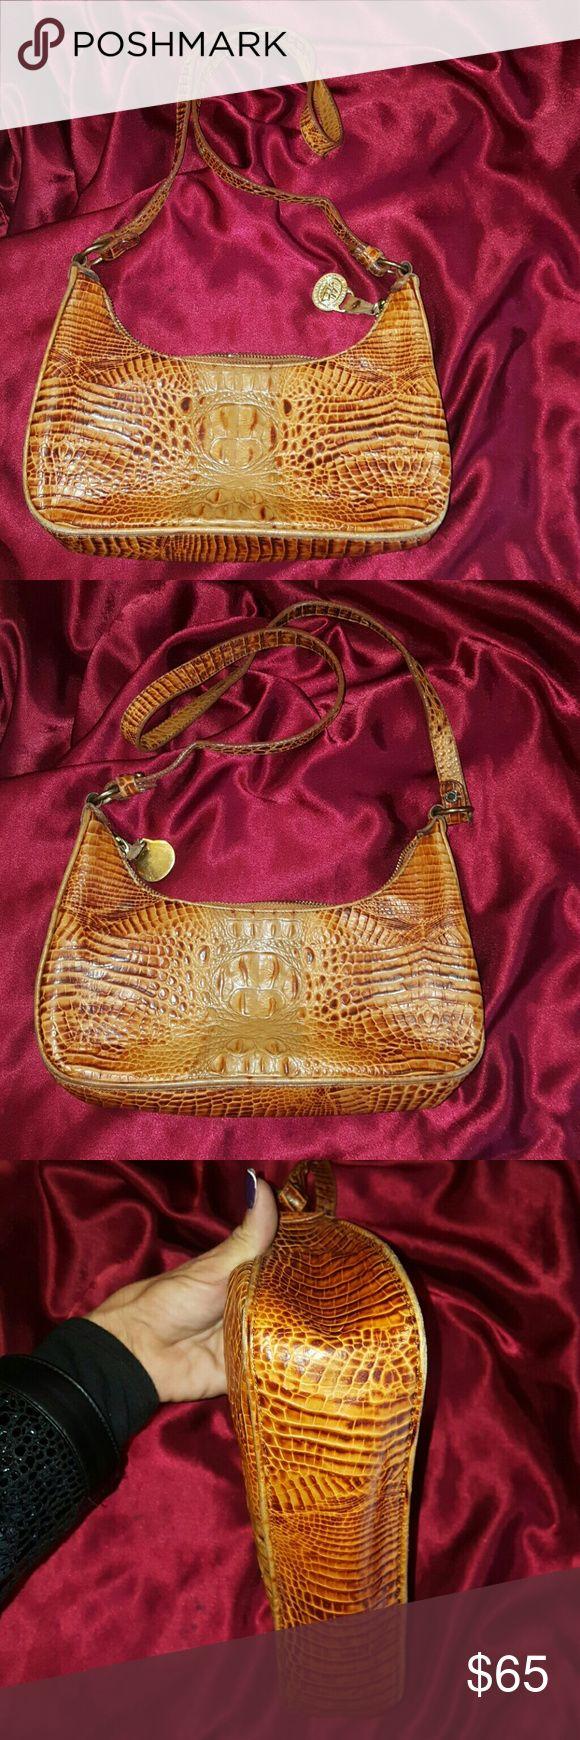 Brahmin blonde pecan gator hobo shoulder bag This is a beautiful authentic Brahmin blonde pecan colored alligator / crocodile hobo shoulder bag purse. It is pre-owned that still has a lifetime of you left. Measures 7 X 10 X 3, strap drop is 17. Brahmin Bags Hobos